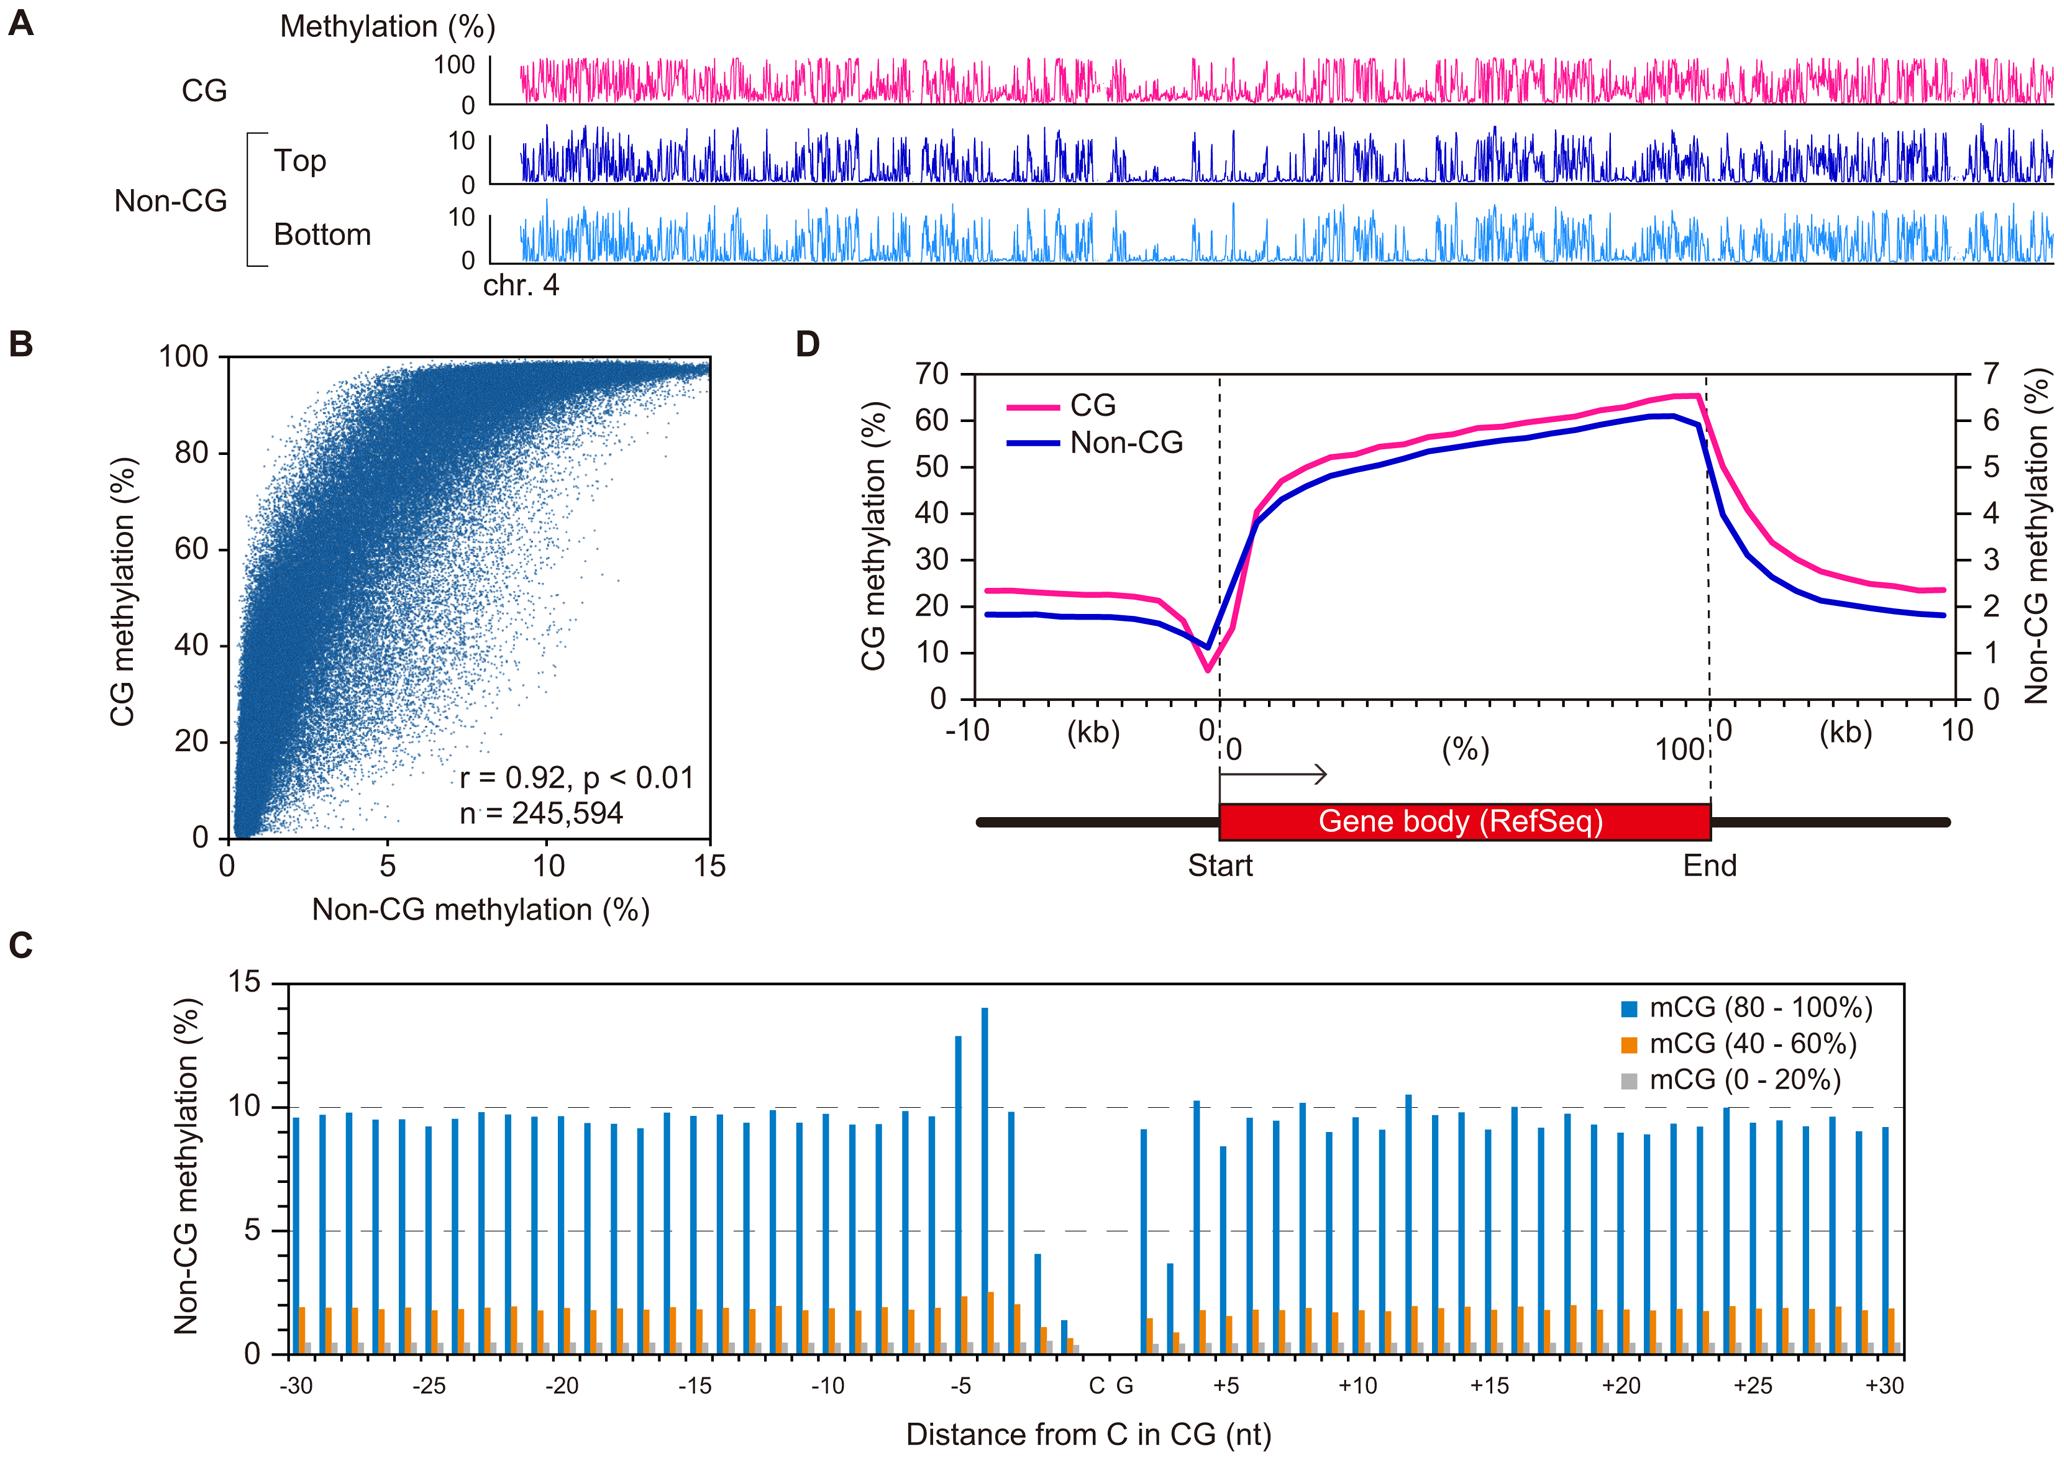 Relationship between CG methylation and non-CG methylation in GVOs.